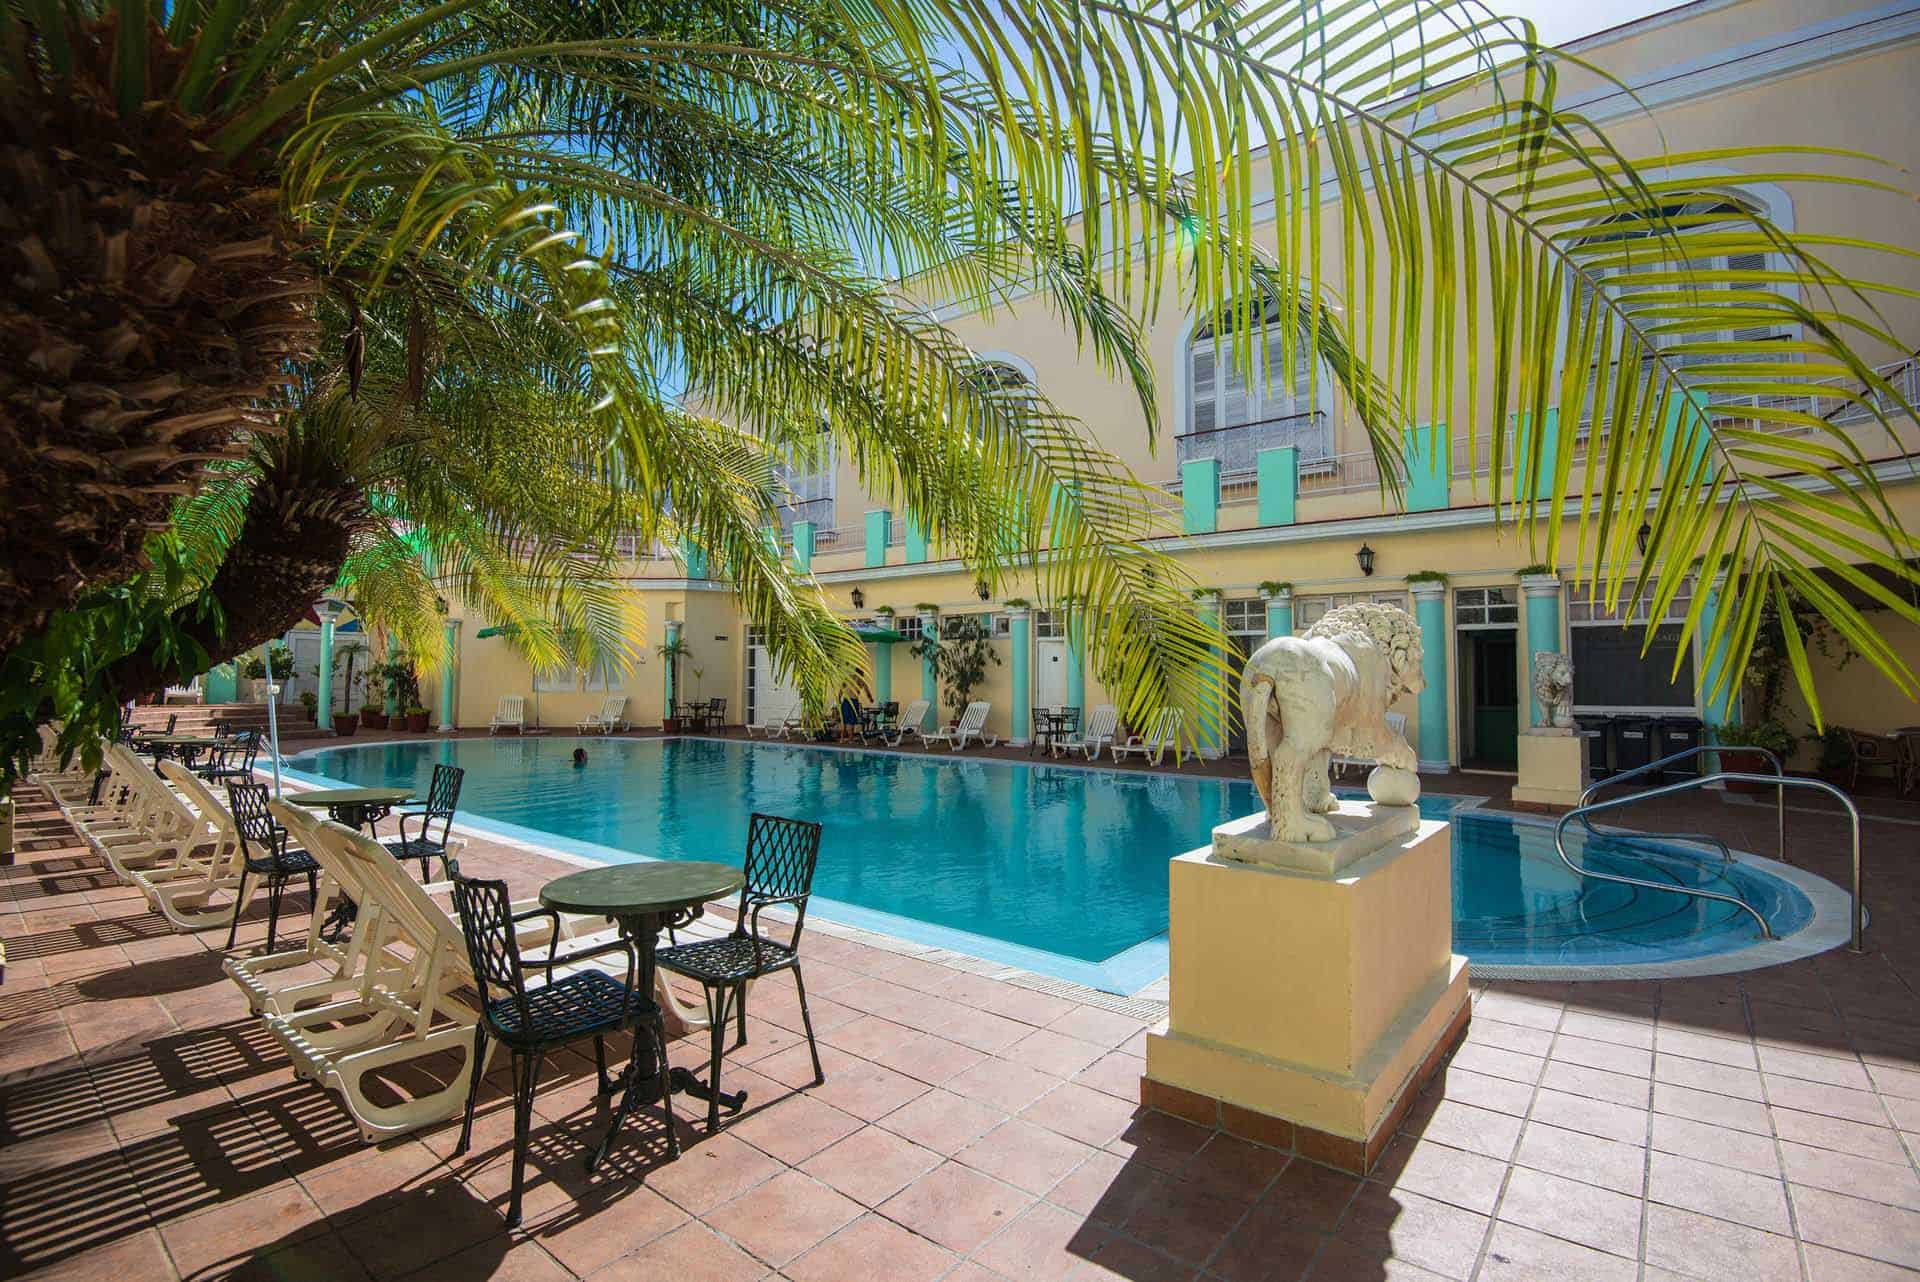 H1146 Hotel La Union Cienfuegos 05 cuba autrement